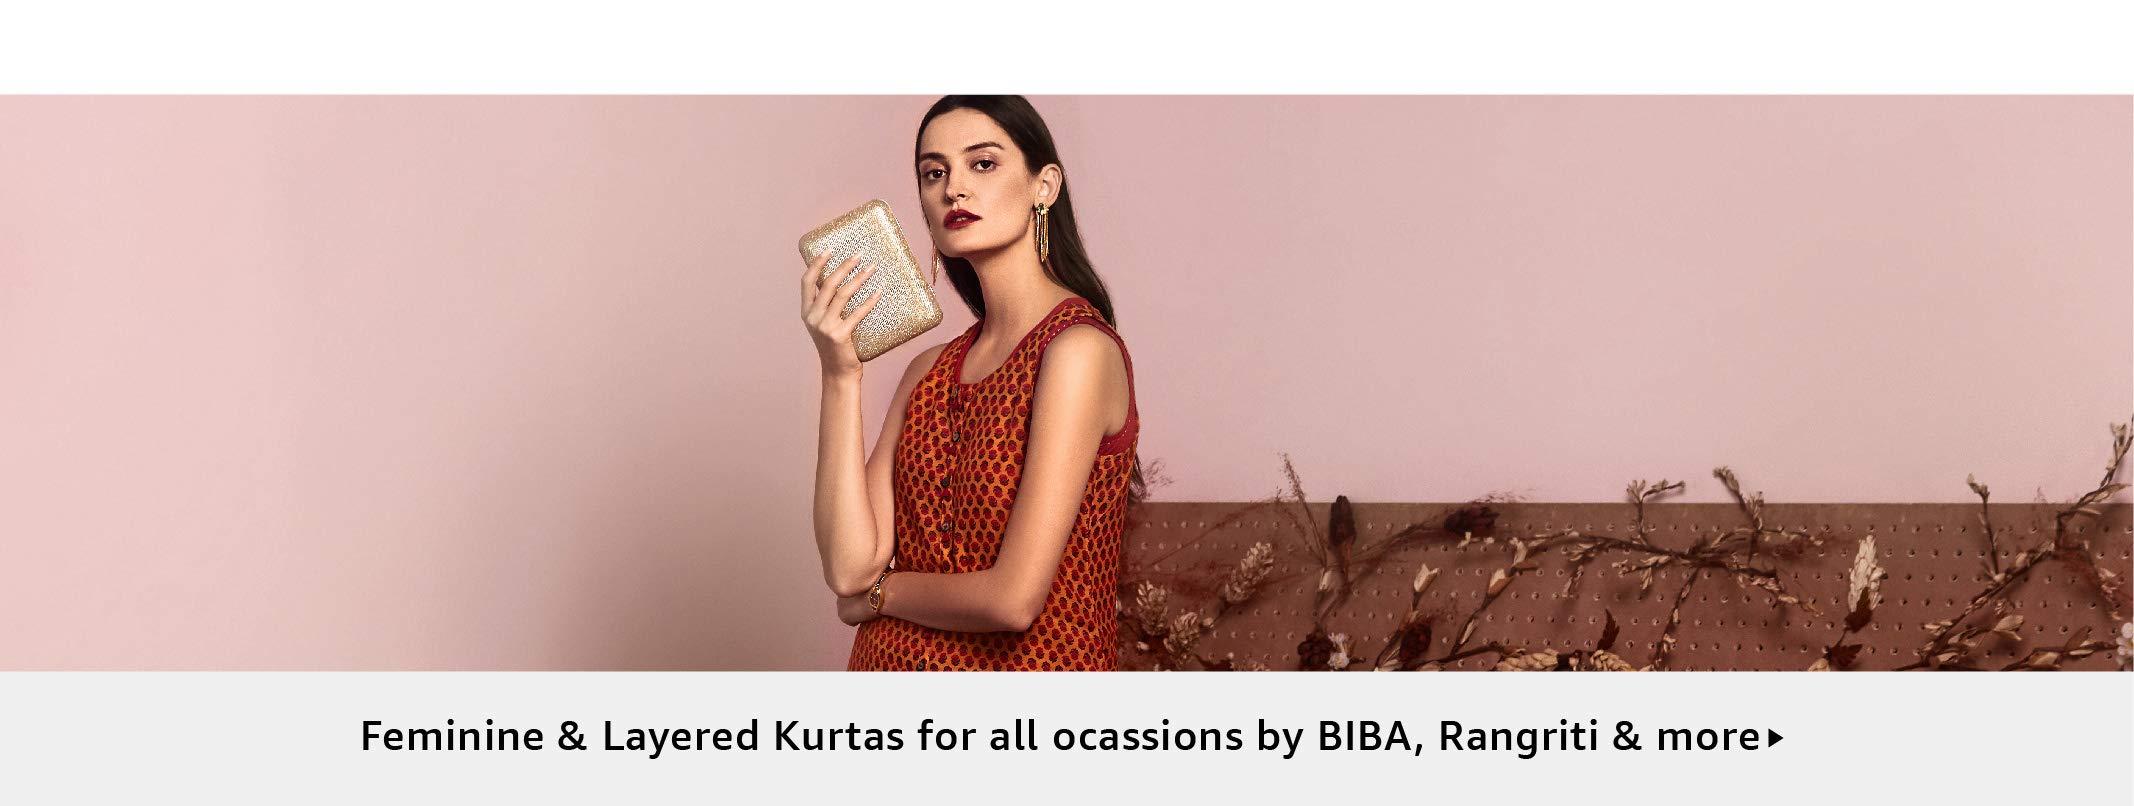 Feminine & Layered Kurtas for all ocassions by BIBA, Rangriti & more